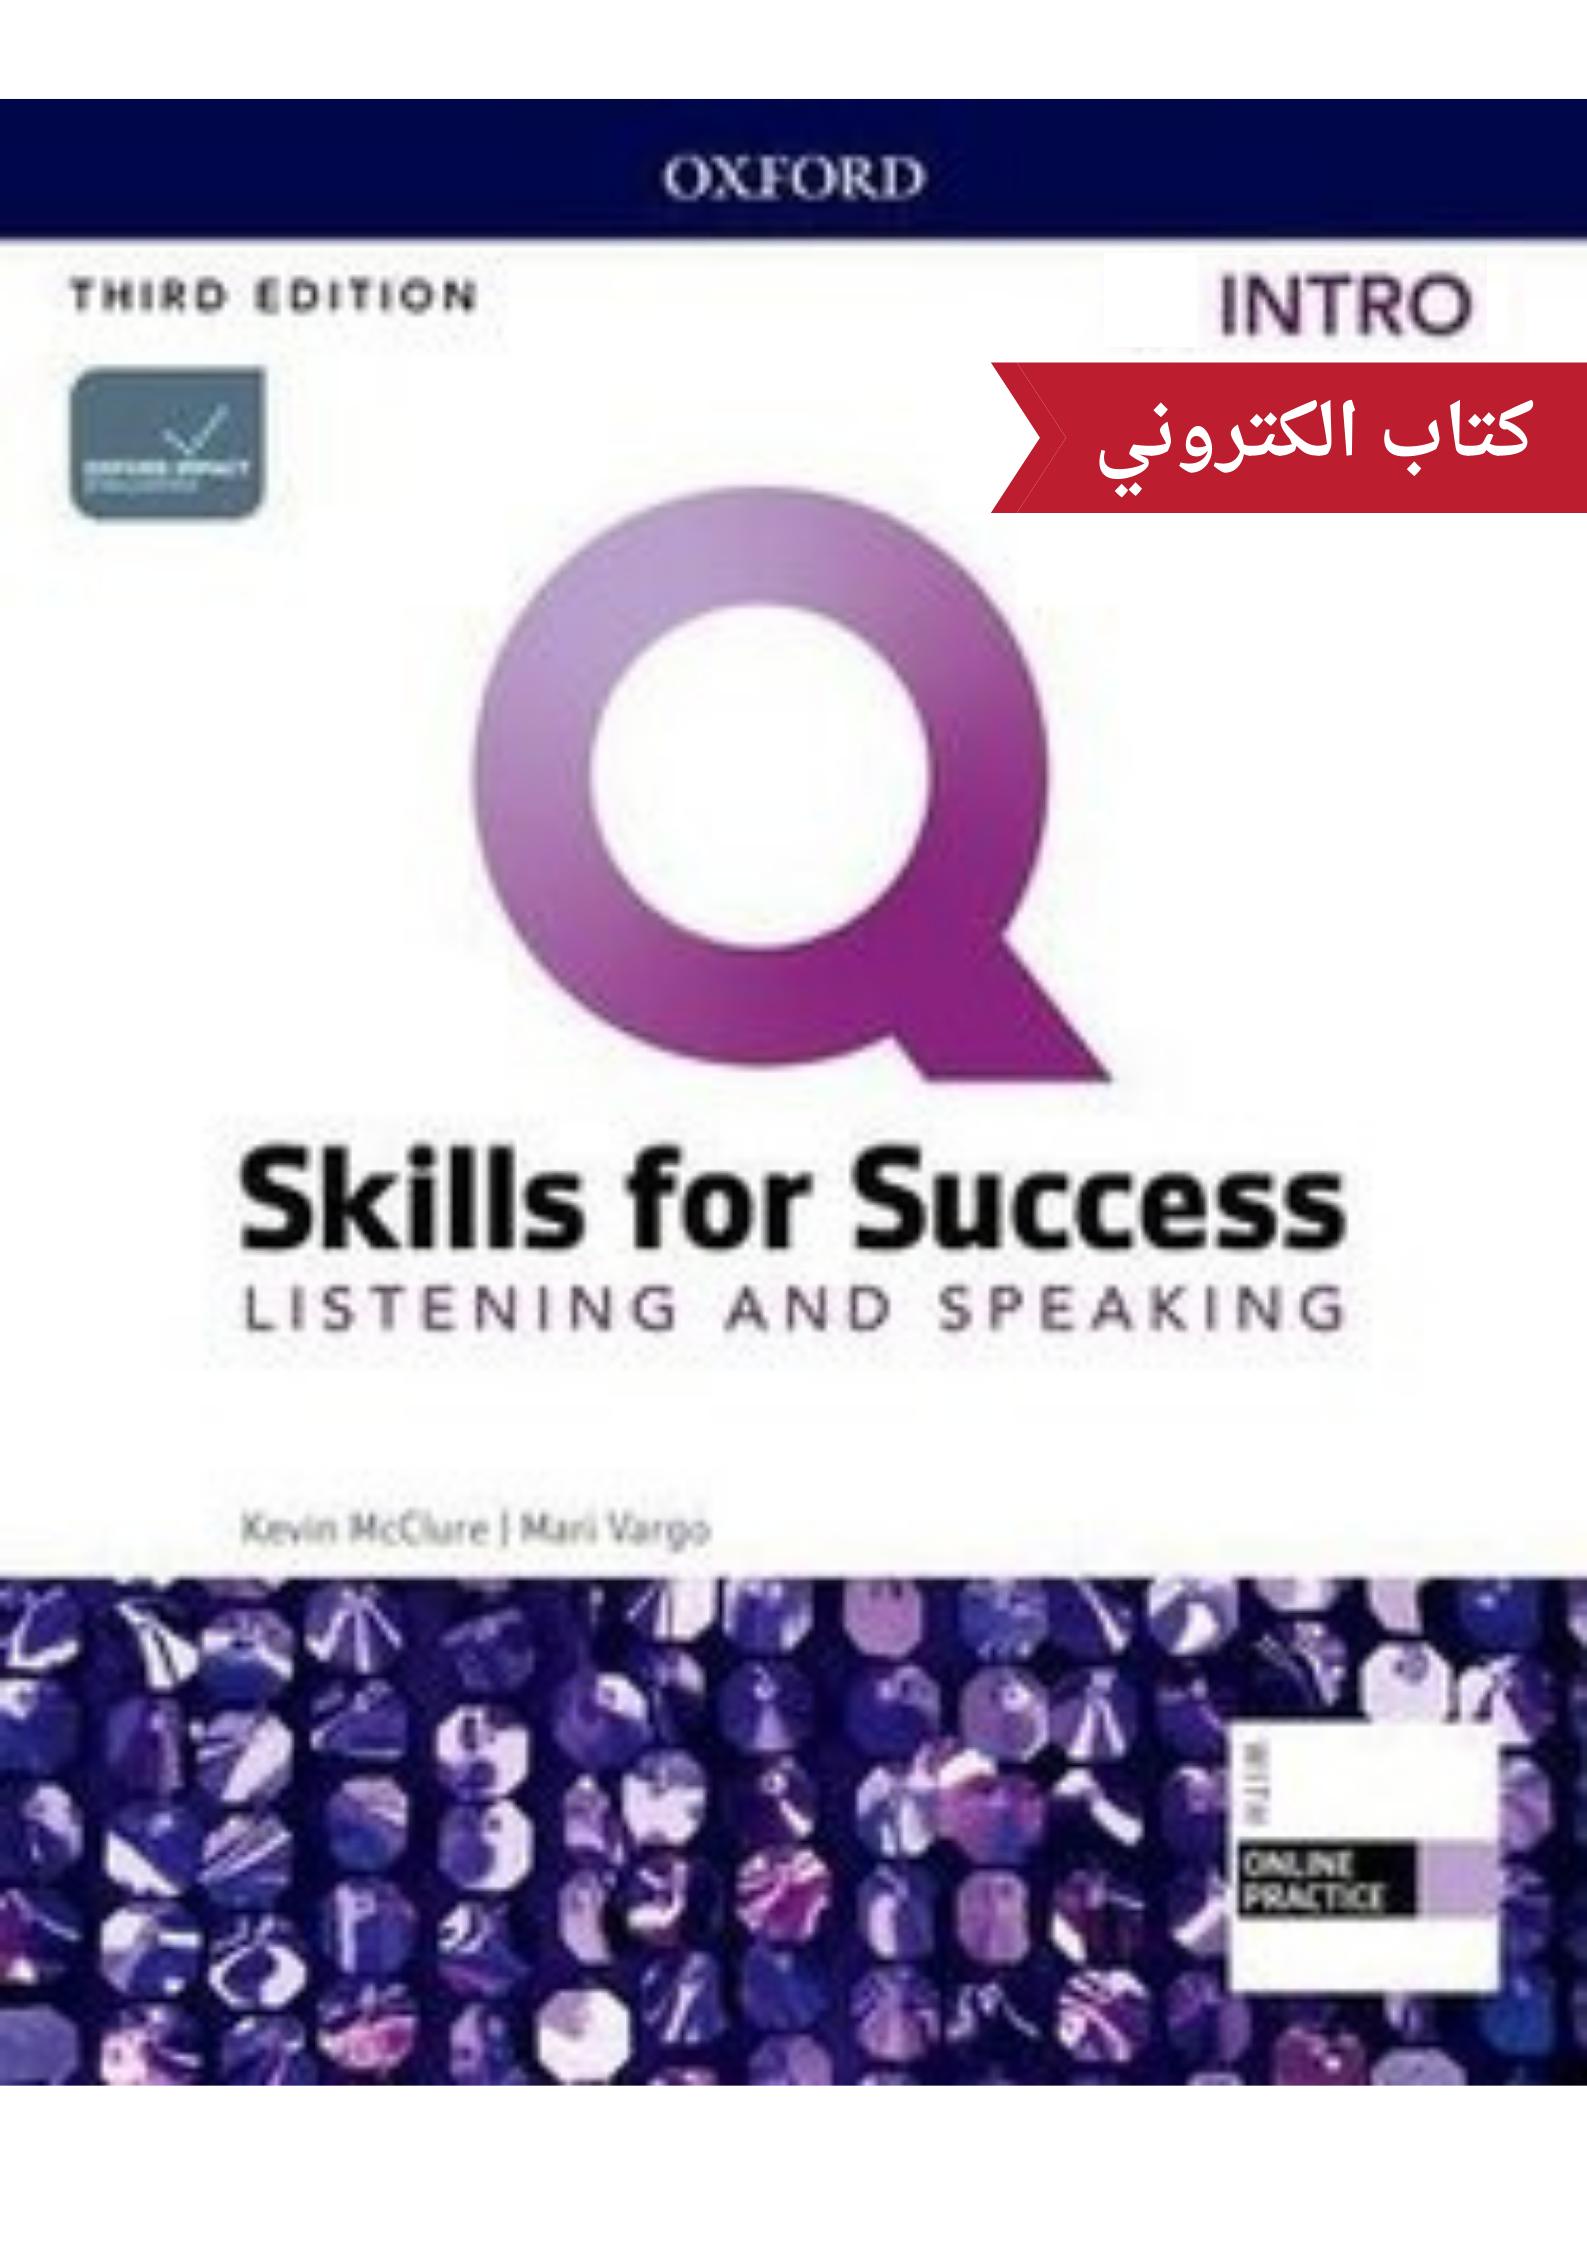 Q Skills ebook Listening and Speaking INTRO